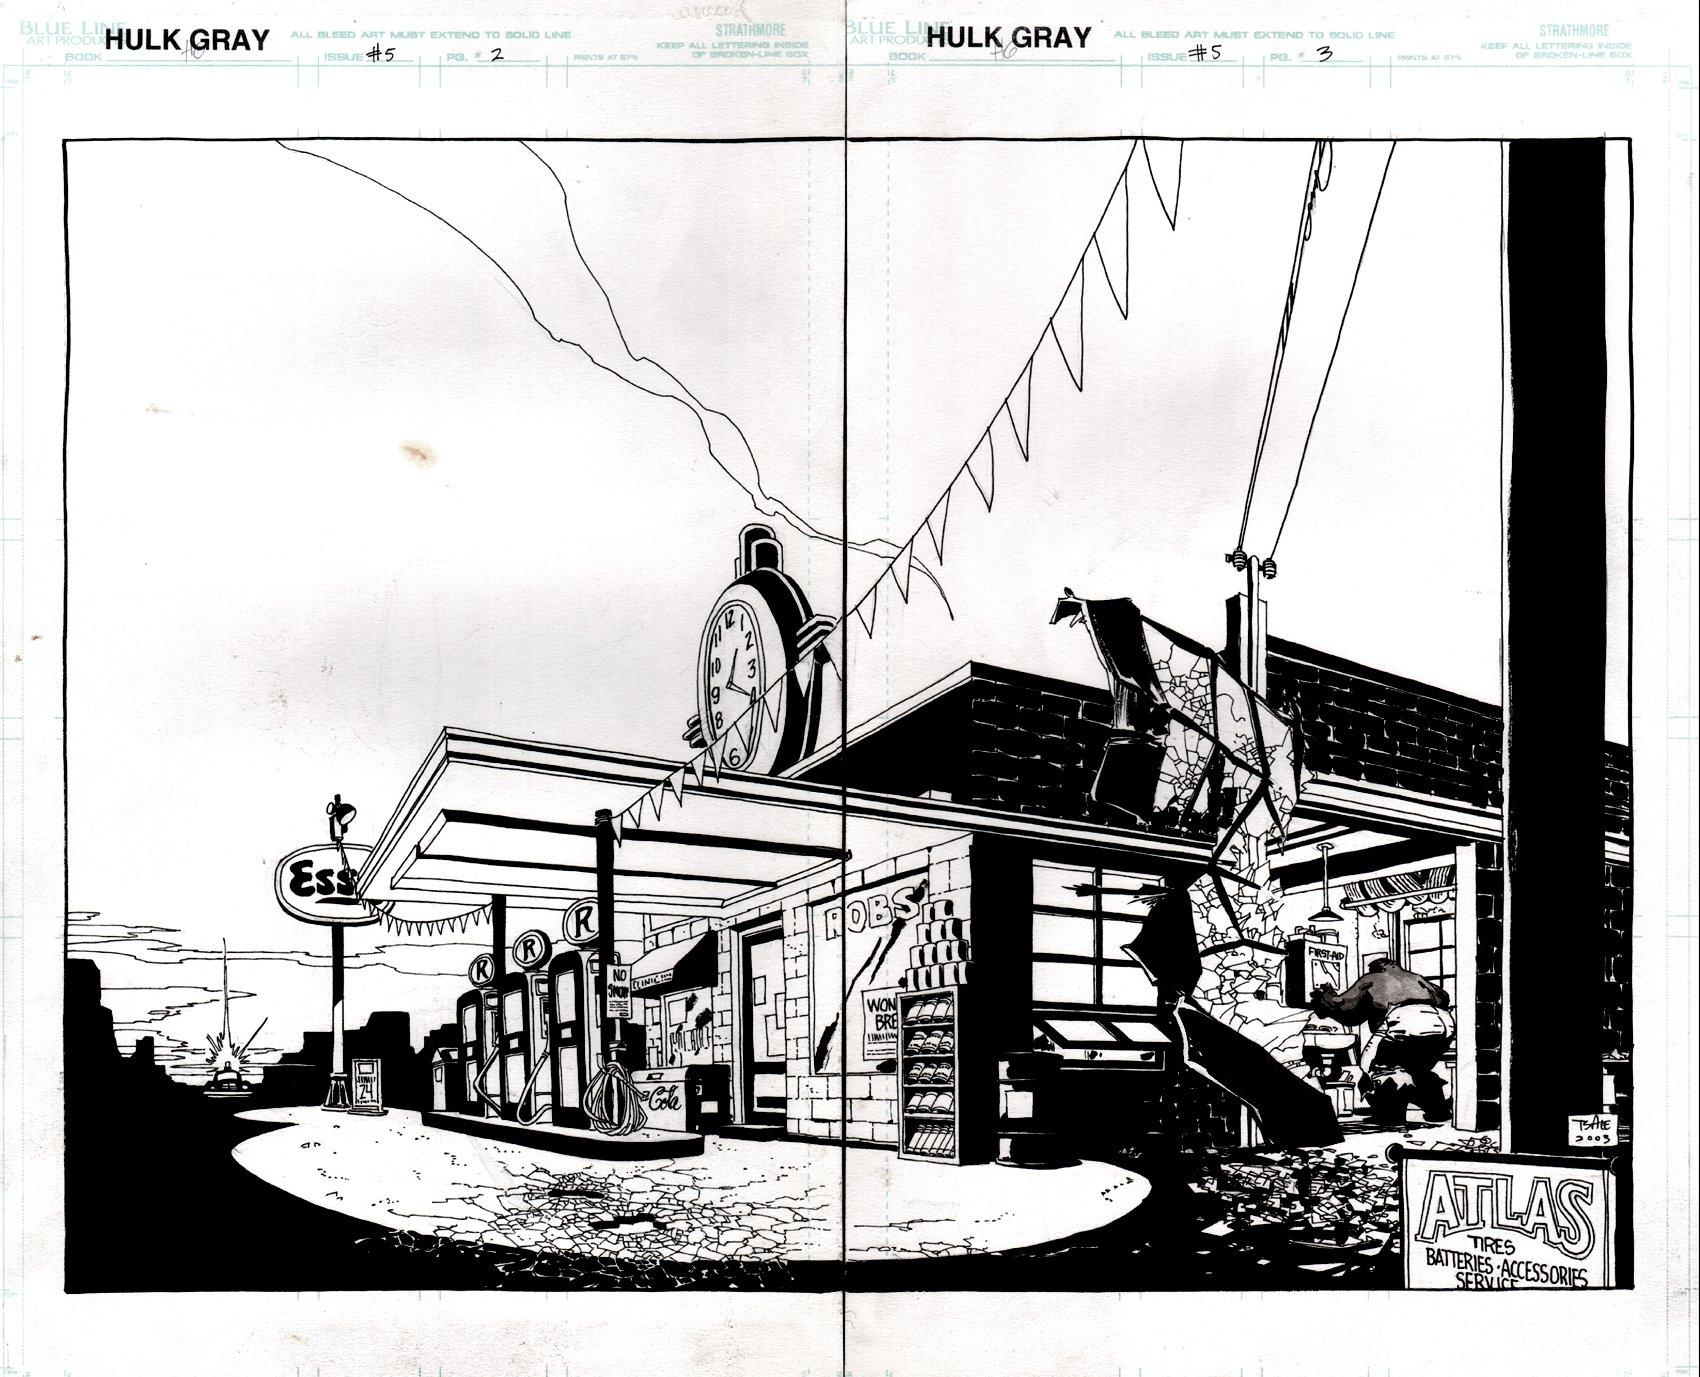 Hulk: Gray #5 p 2-3 Double Spread SPLASH (HULK TRASHES GAS STATION!) 2003